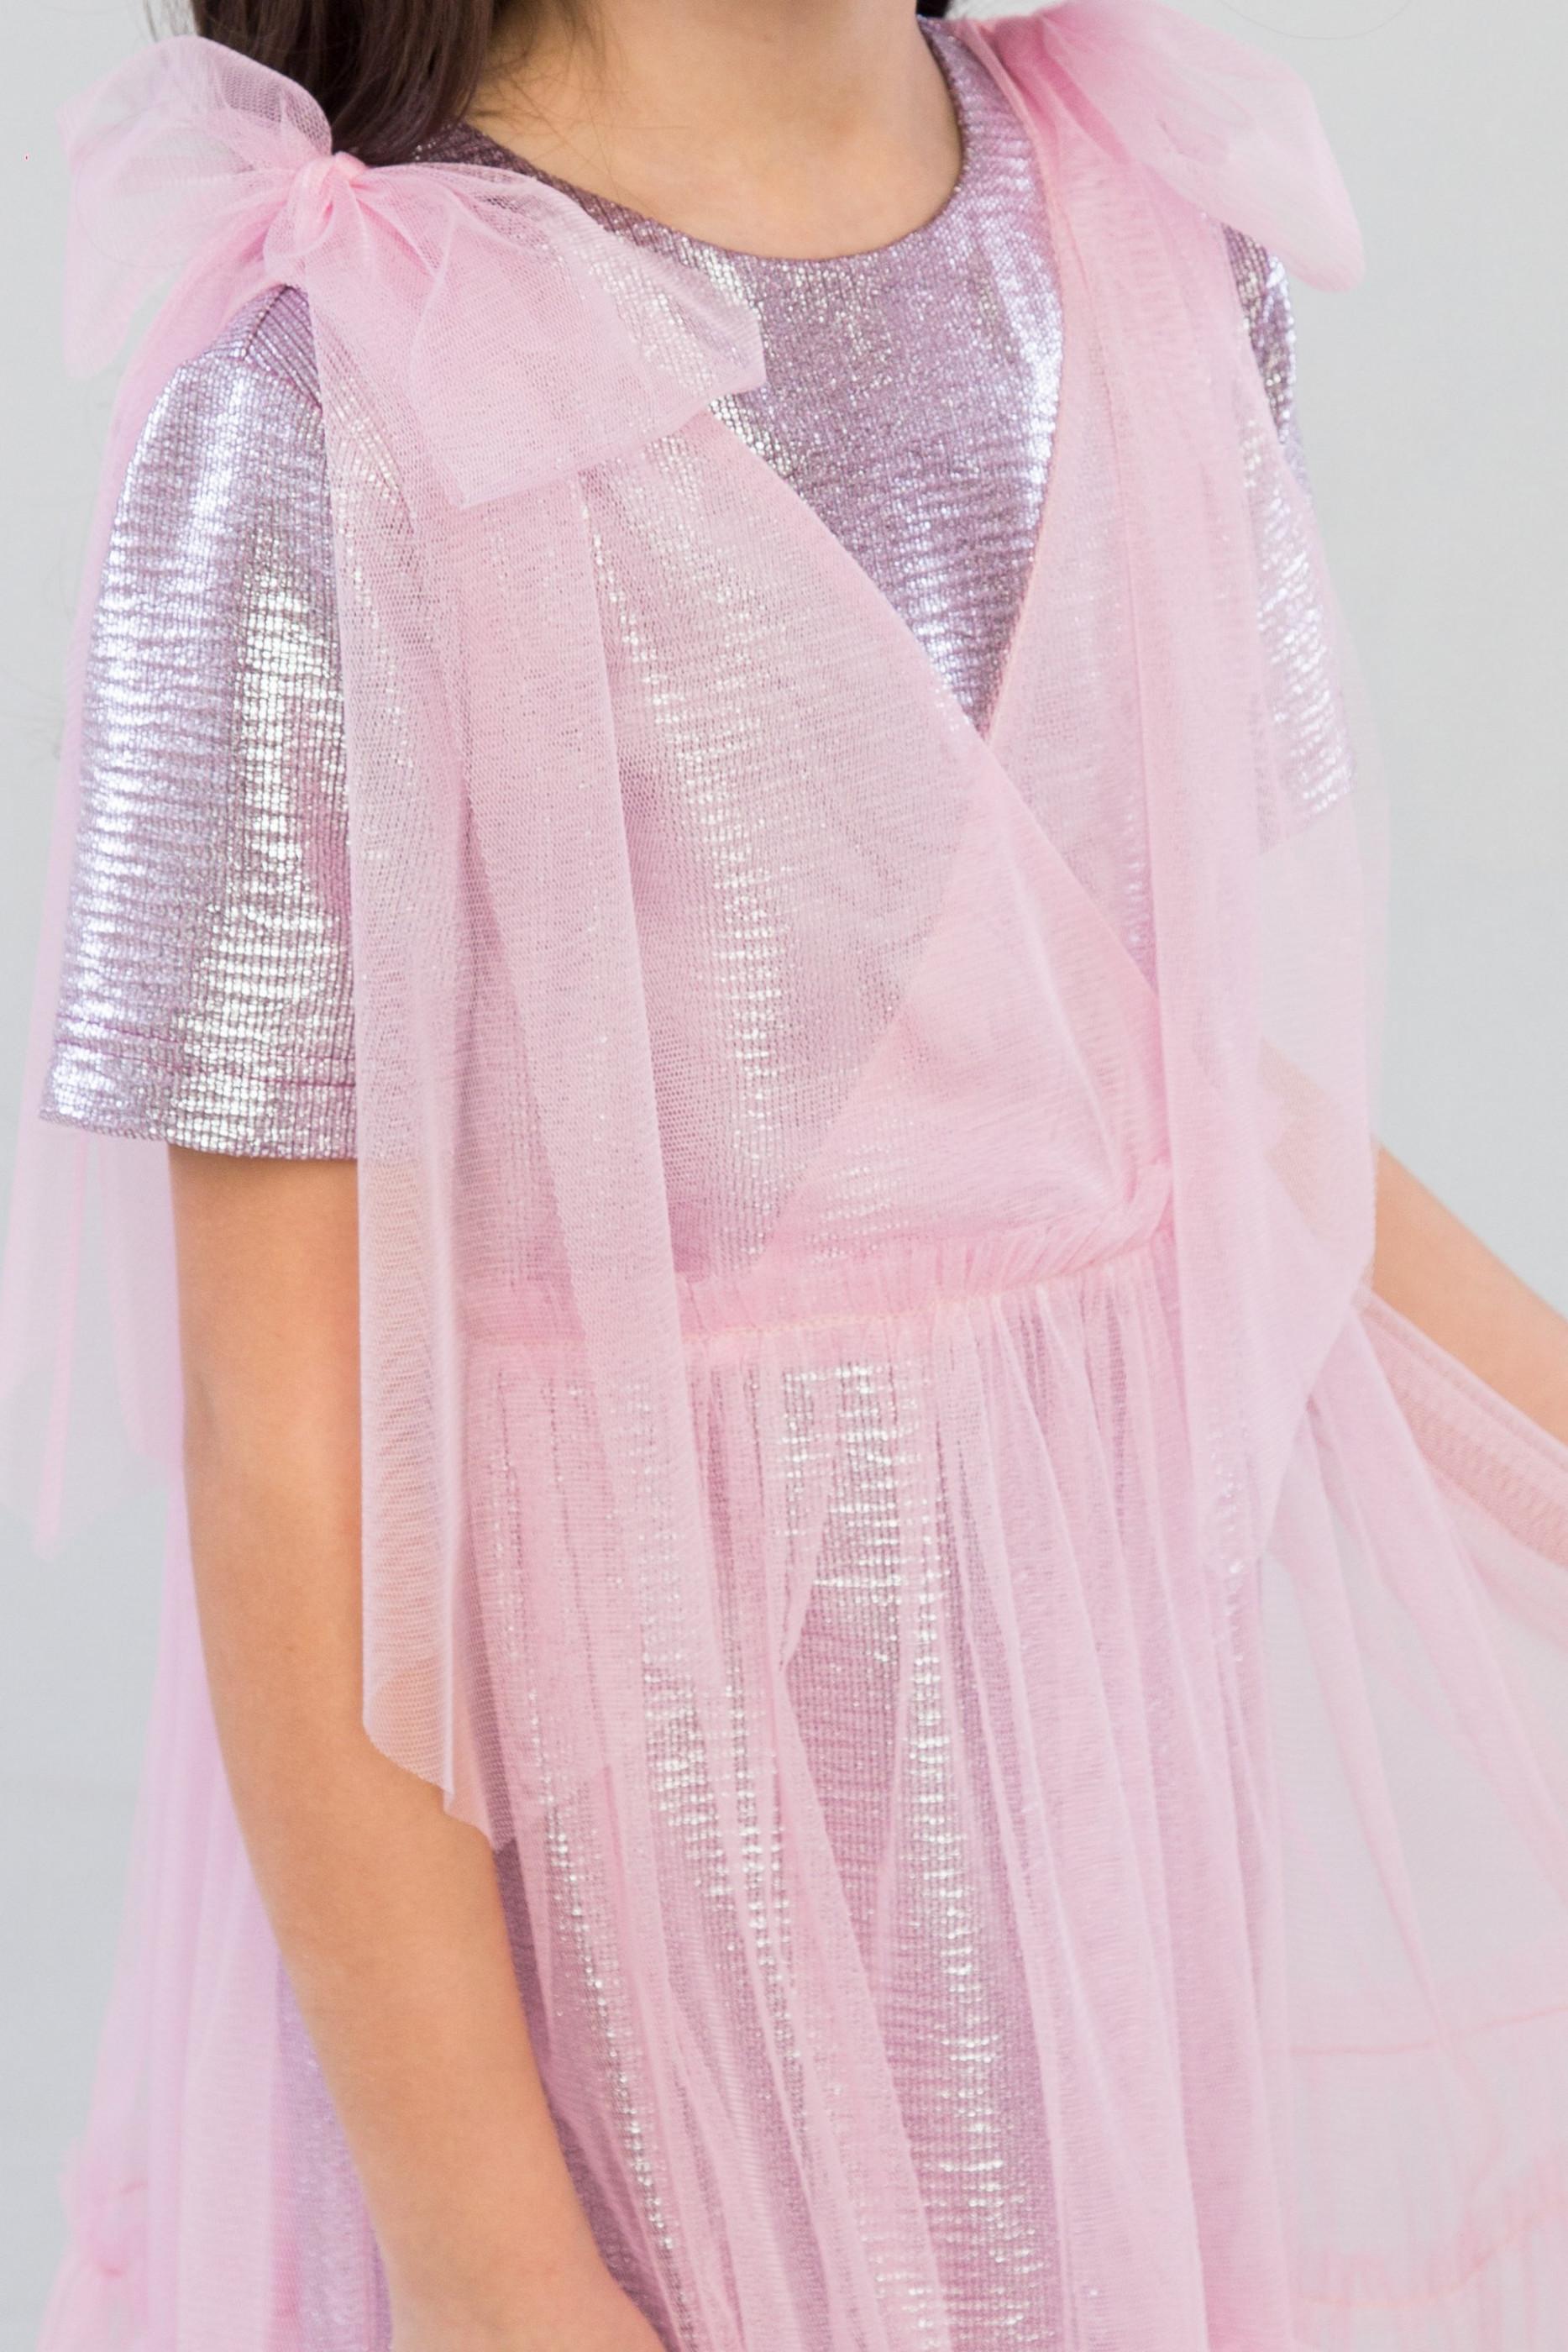 Плаття Сара, фото №2